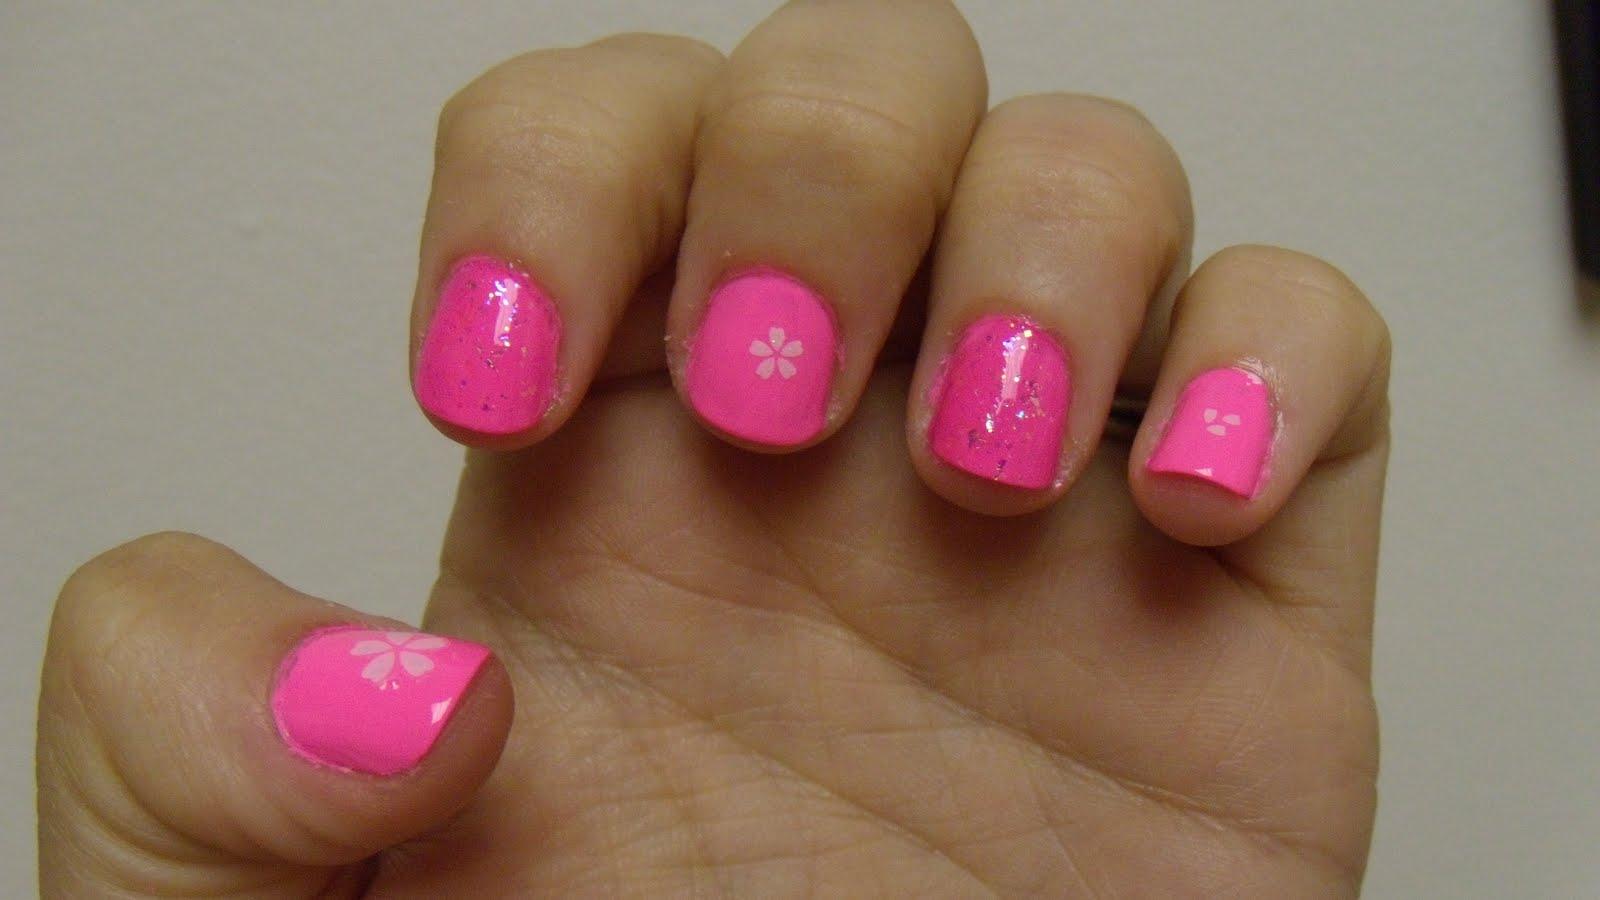 http://2.bp.blogspot.com/-W5jkgS_8gGk/TiZWaNjh_9I/AAAAAAAAAU0/I8FSAF9IGVQ/s1600/2011-07-19+Pink+Wednesday+ChG+Shocking+Pink+%2528Neon%2529%252C+OPI+I+Lily+Love+You.jpg